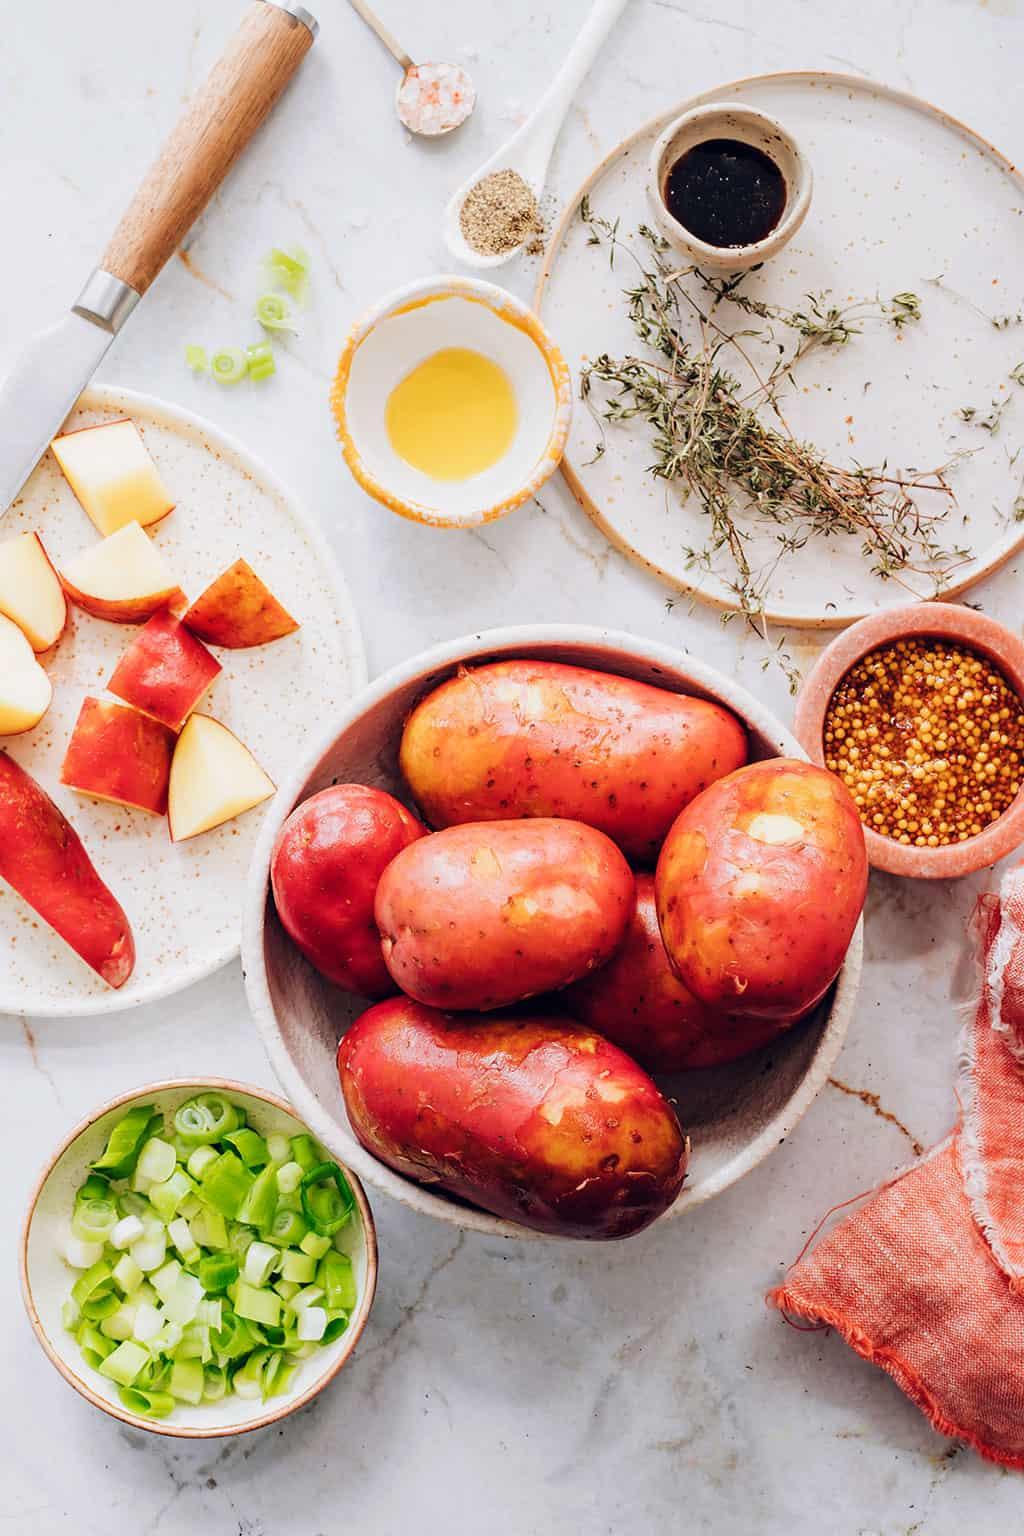 Ingredients for German Potato Salad